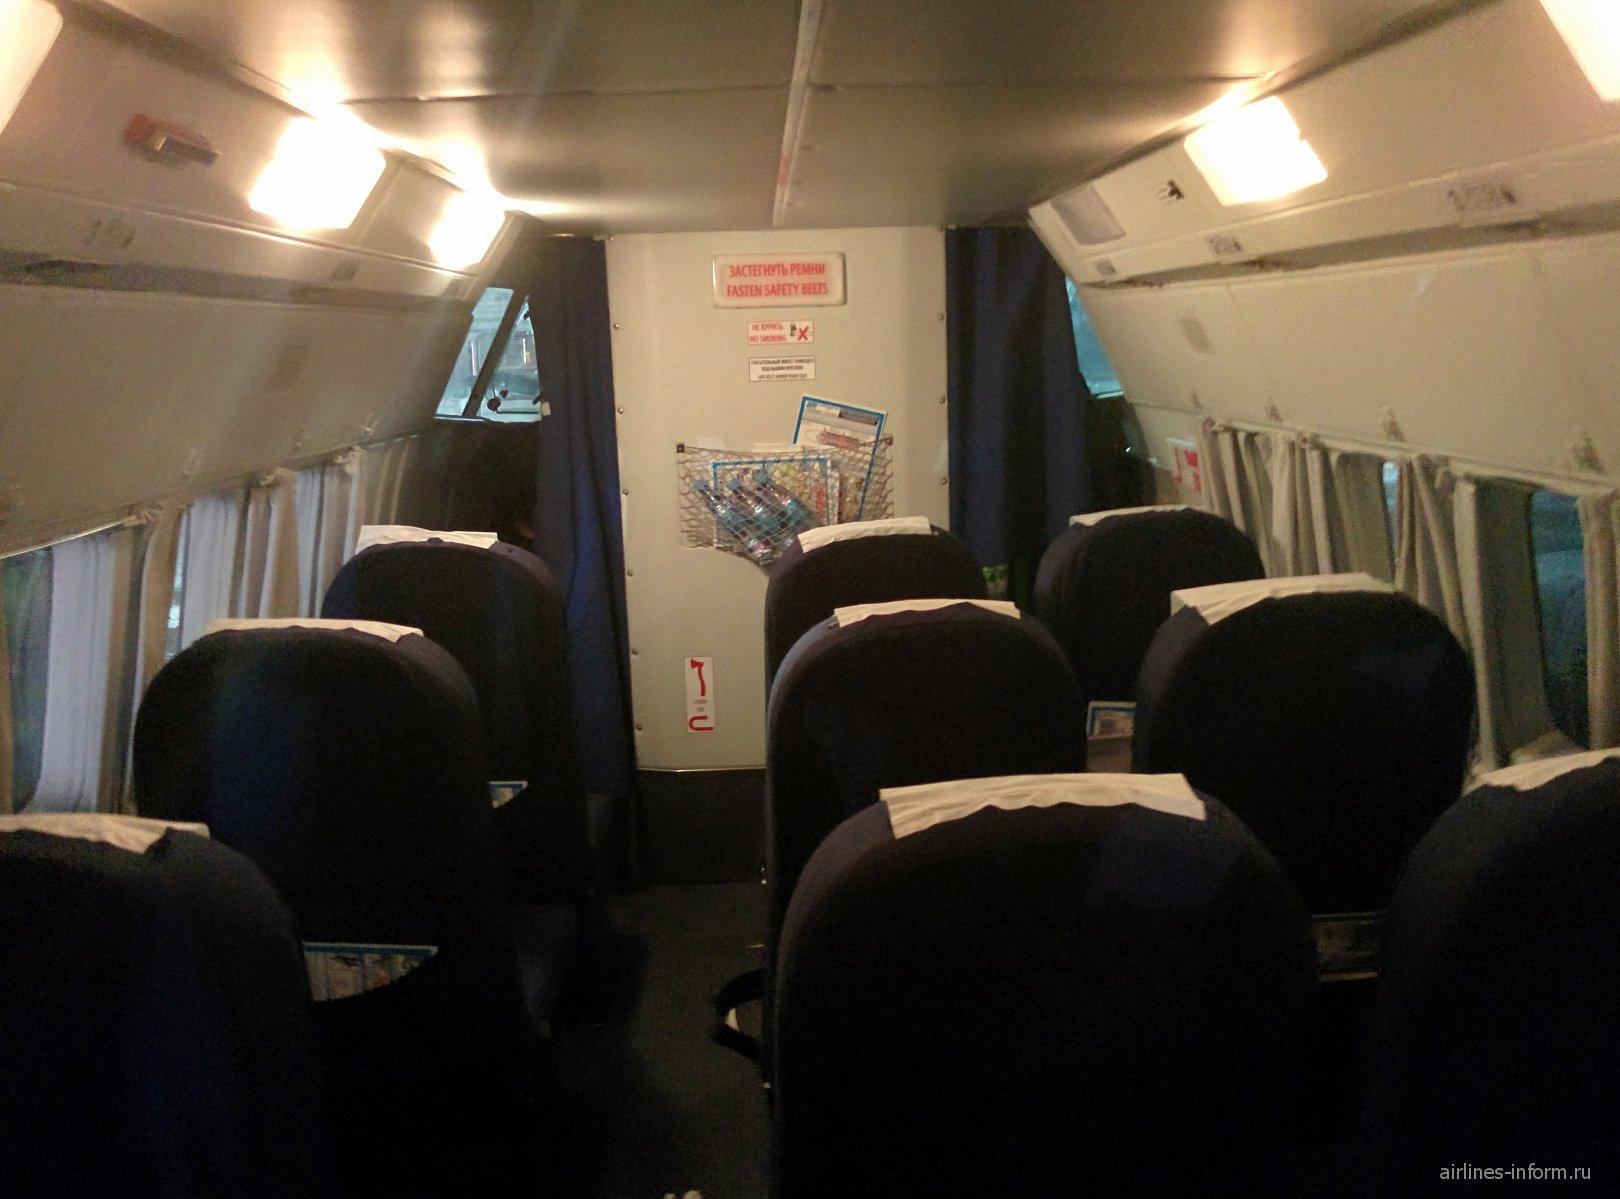 Салон самолета Л-410 авиакомпании